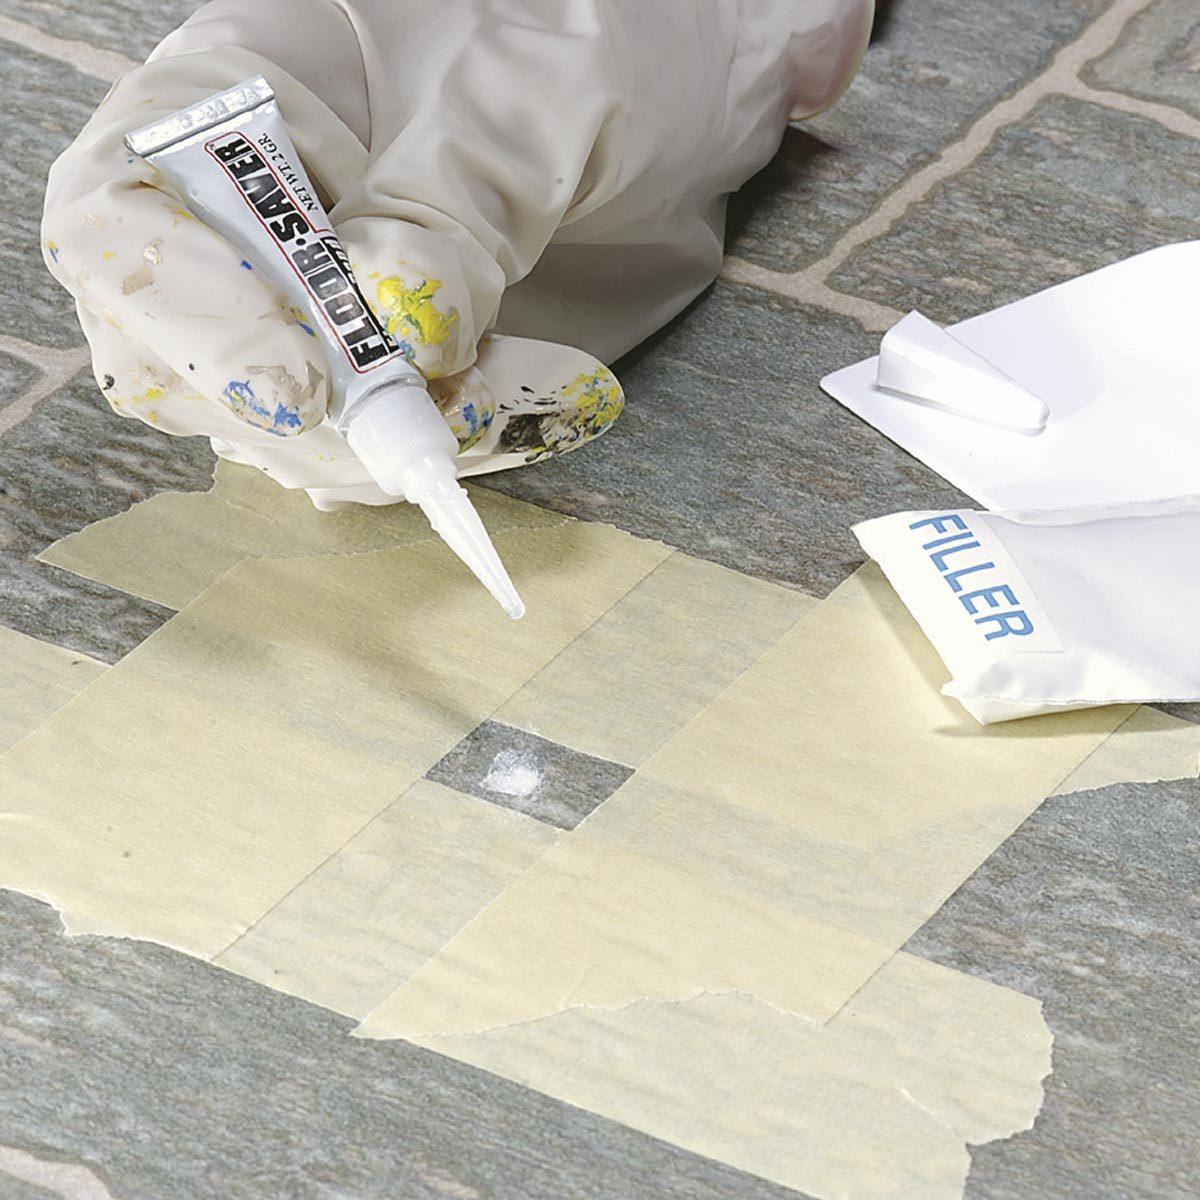 Repairing Vinyl Flooring | Family Handyman